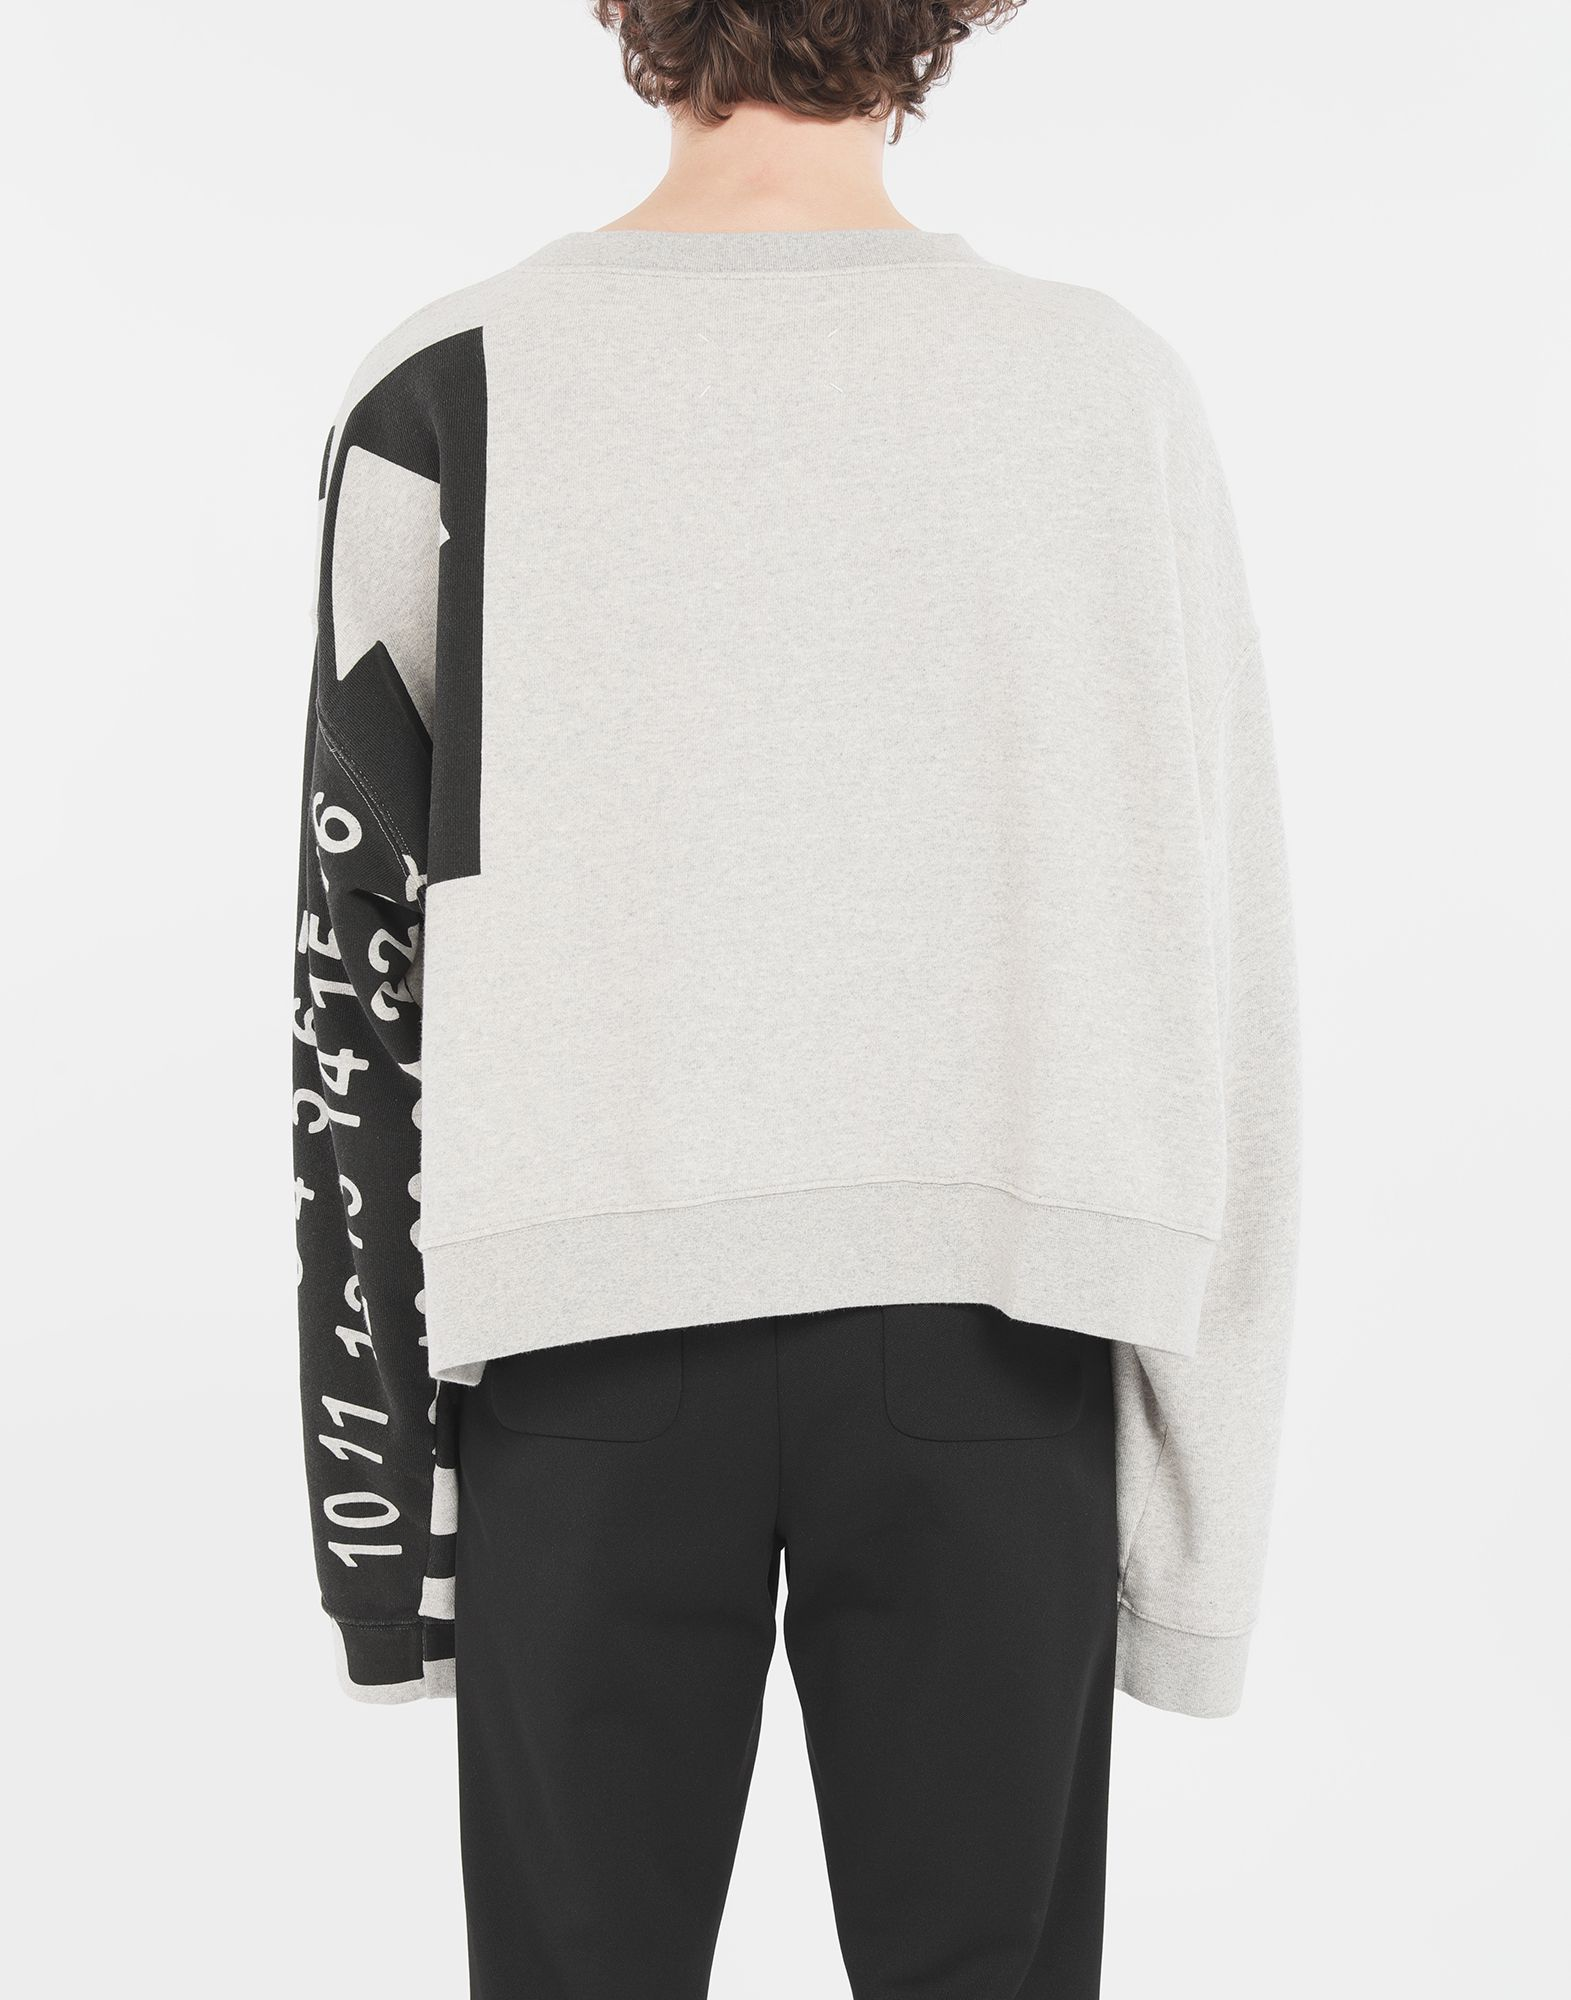 MAISON MARGIELA Sweatshirt 'Fragile' Sweatshirt Herr e